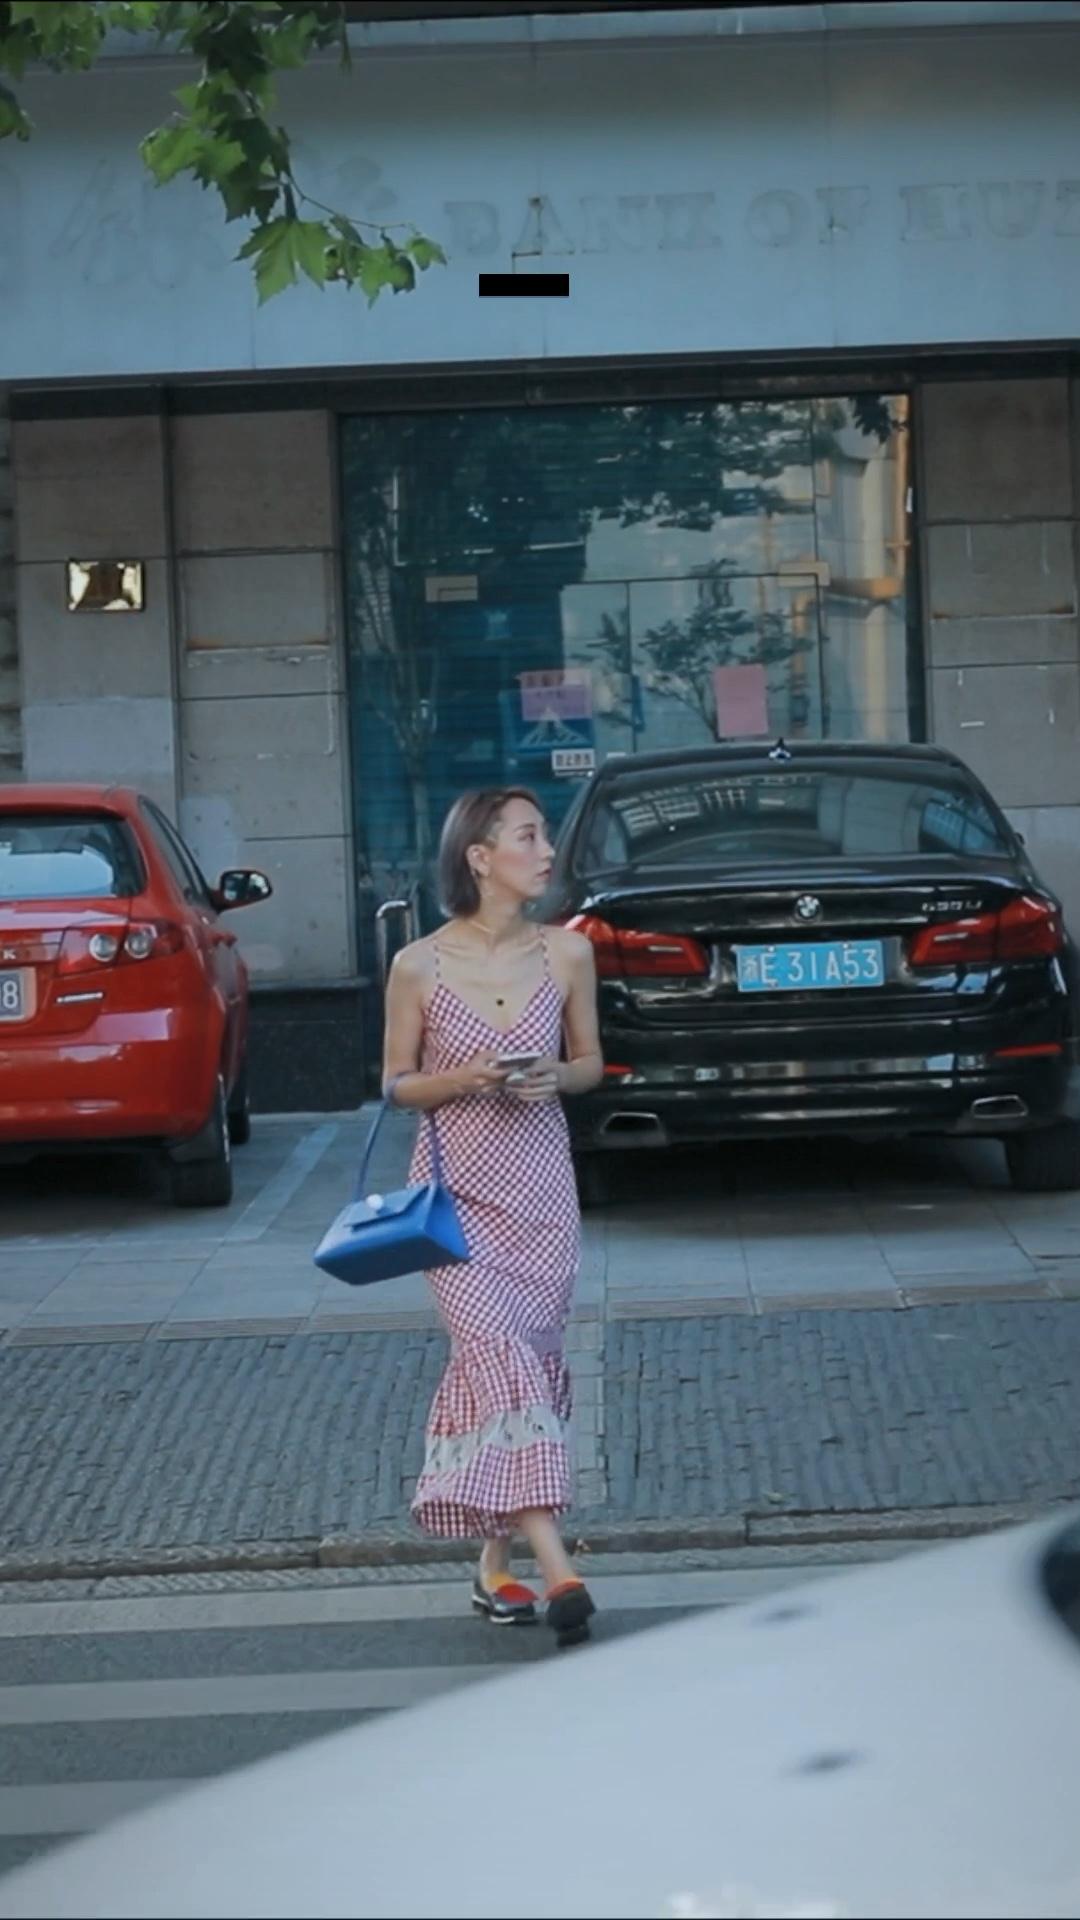 ViLook | Vol.308 ———— 红色格纹连衣裙,裙摆那么好看!复古又时髦,必然是这个温暖的初秋约会度假首选!很心机的搭配了同样粉色系的不对称耳环,其中一边可以挂在耳骨上,绝美!包包是宝蓝色的,跟衣服行程鲜明对比~鞋子特地穿了这双异型跟的三原色拼色~这么穿去约会,男朋友可能会犯花痴😜 #早秋约会款,甜蜜升级~#